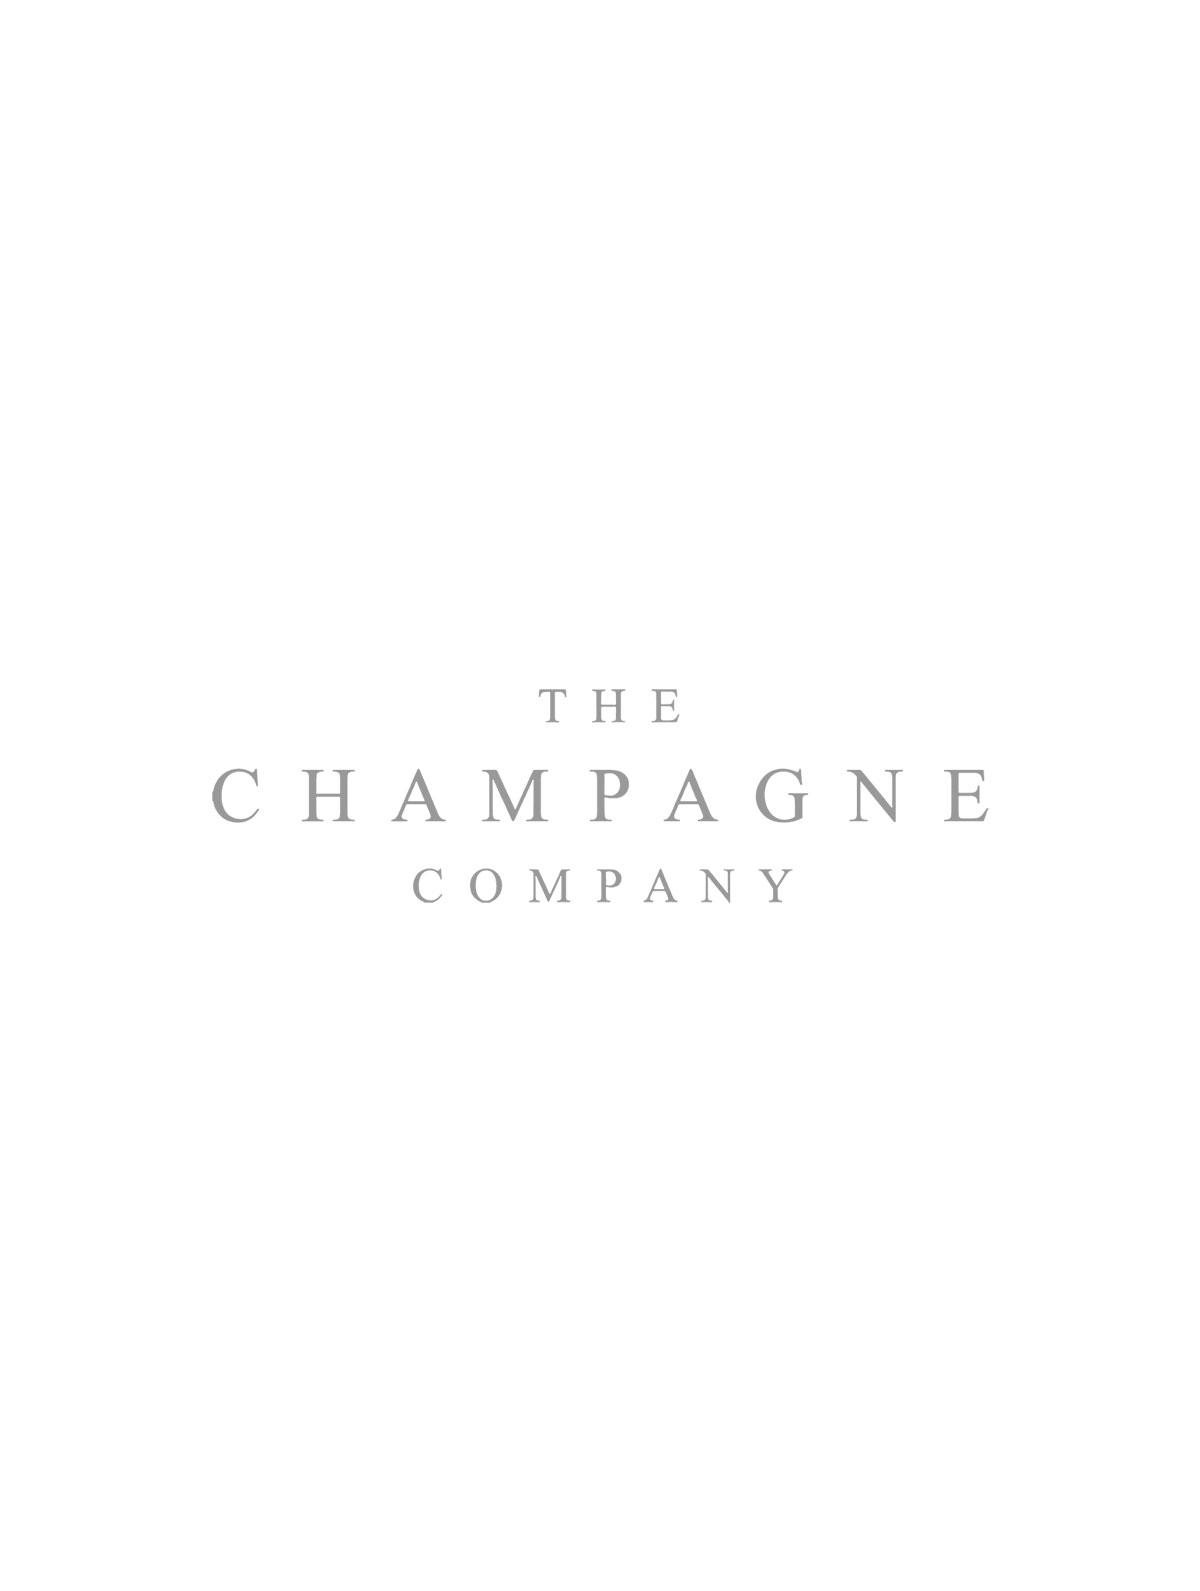 Henri Giraud Fut De Chene Champagne 2000 Vintage 75cl